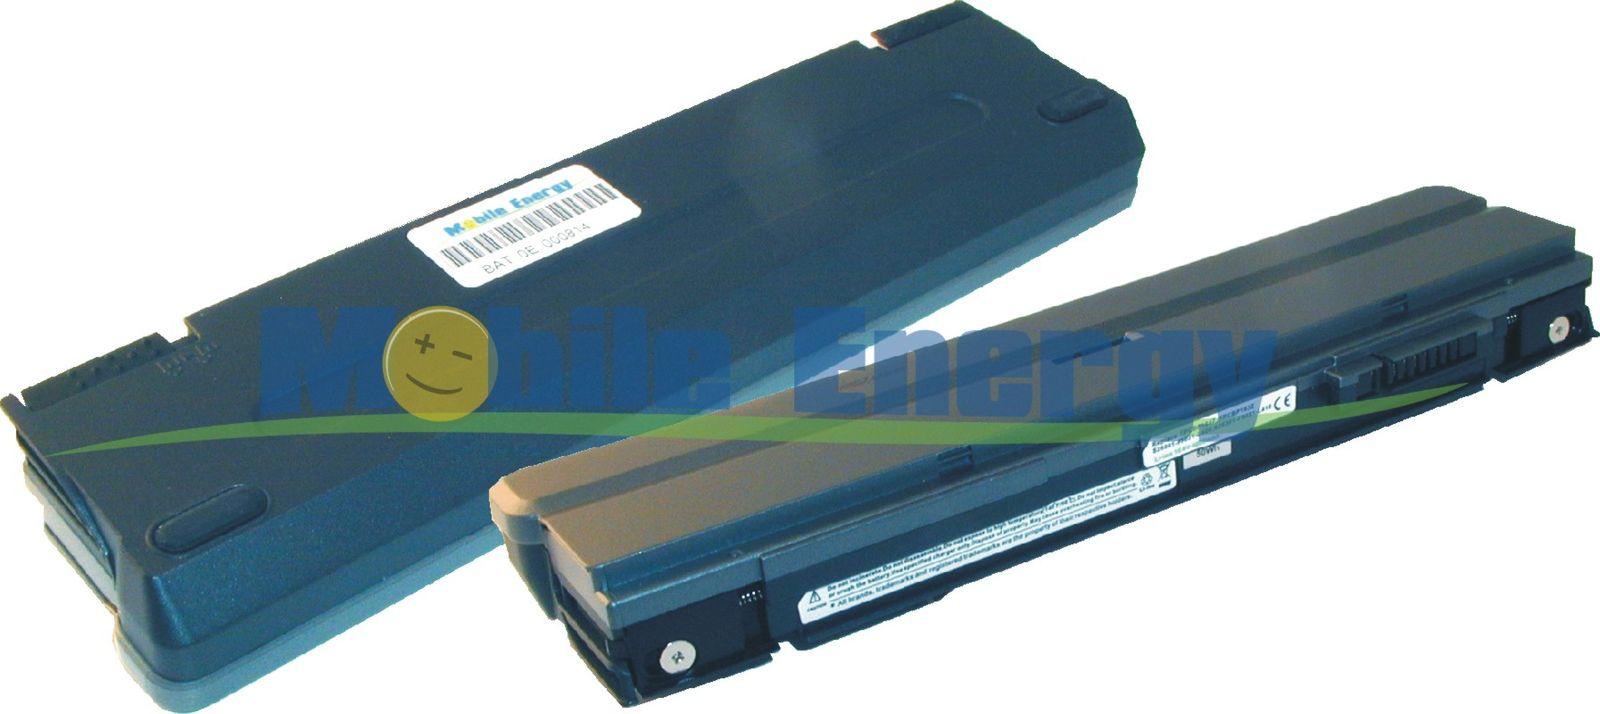 Mobile-Energy Baterie Fujtisu Siemens LifeBook P1510 / P1510D /